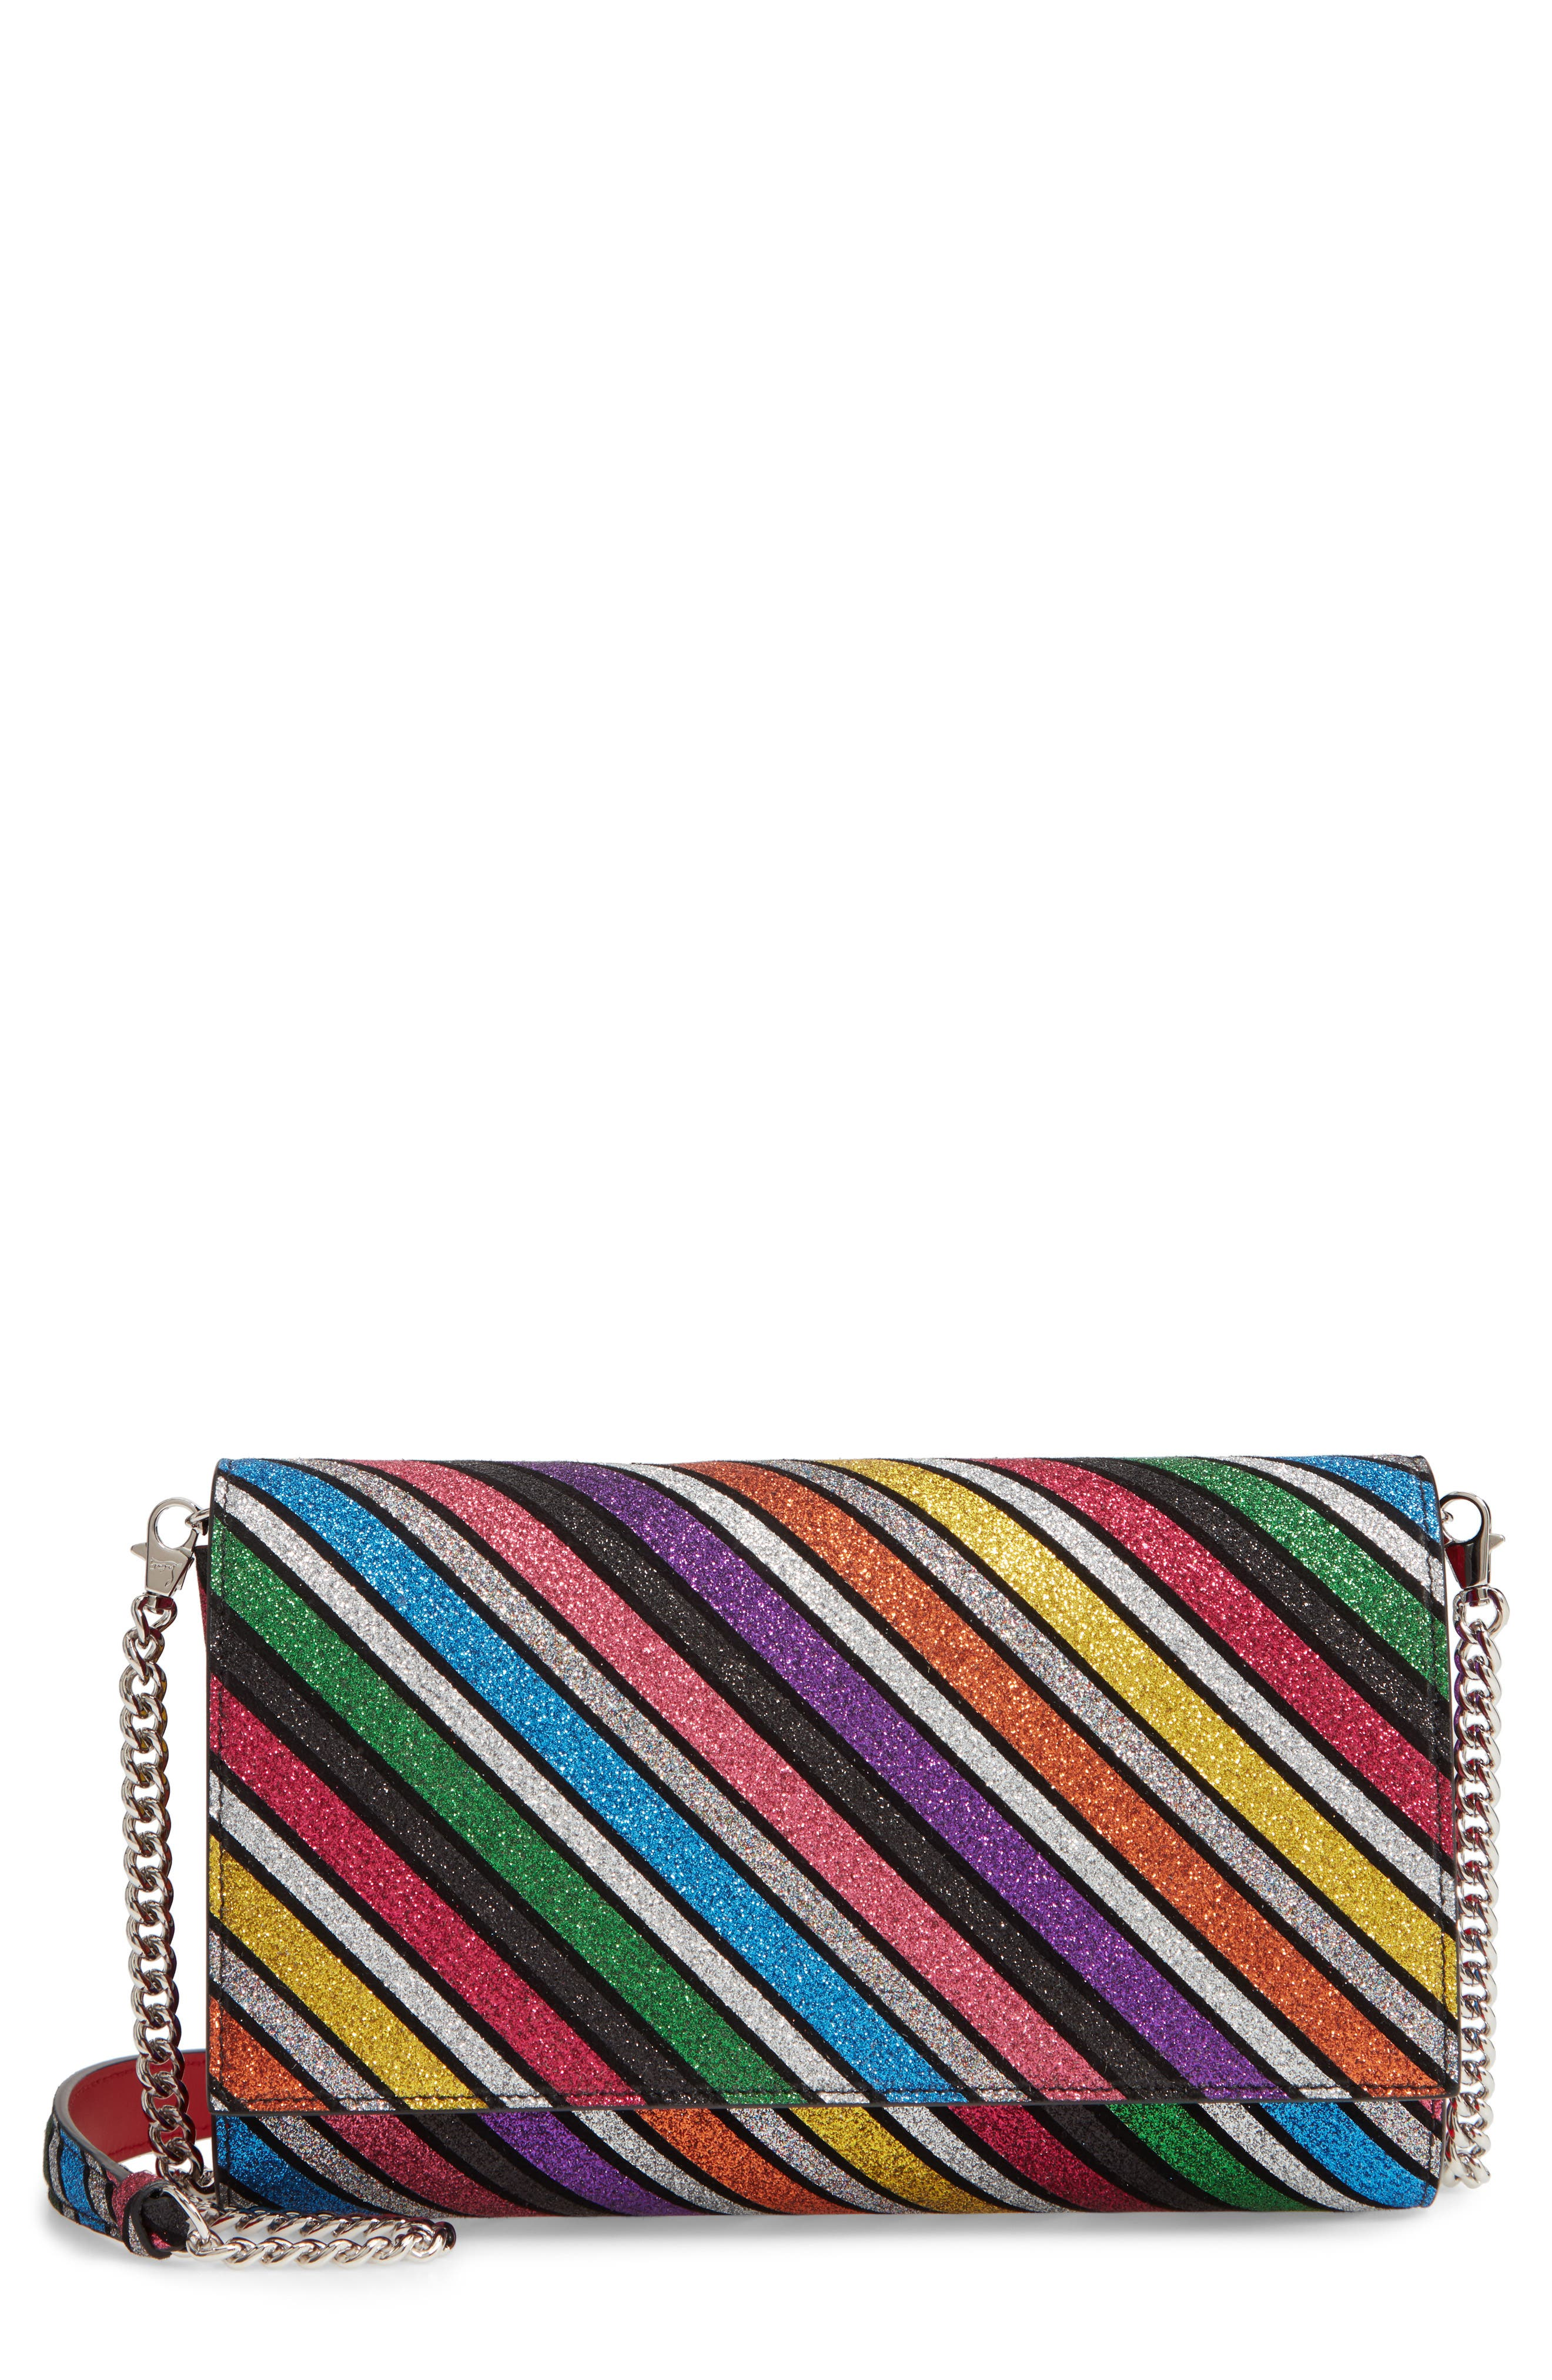 CHRISTIAN LOUBOUTIN, Paloma Glitter Rainbow Suede Clutch, Main thumbnail 1, color, 040